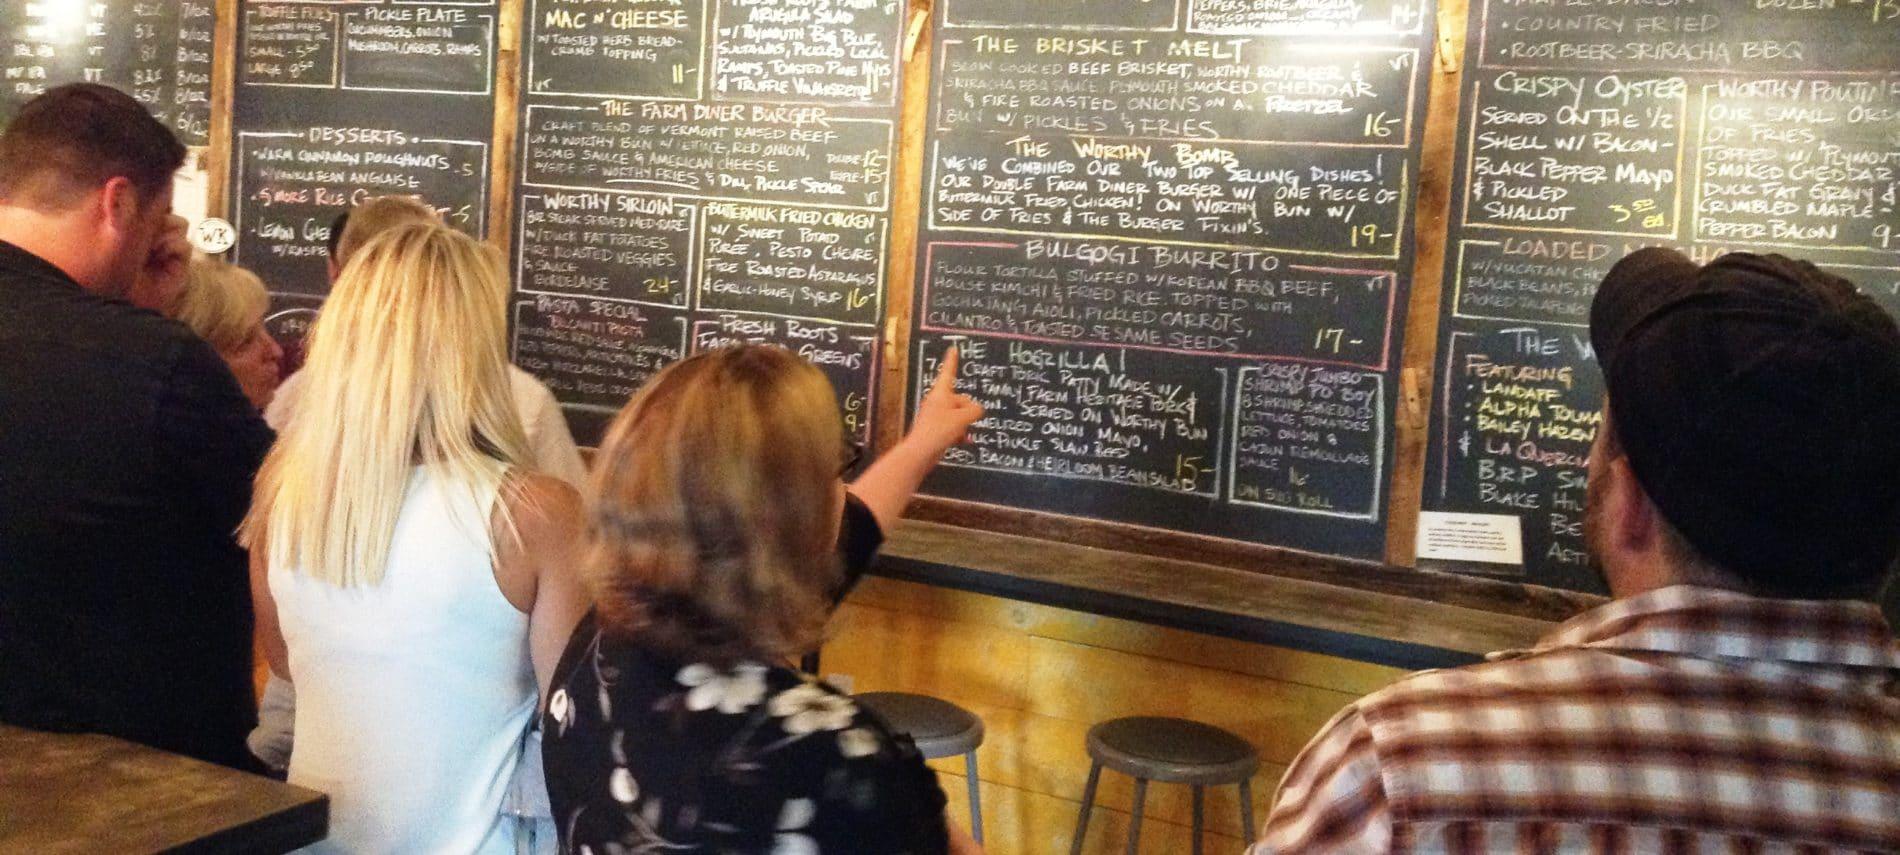 Worthy Kitchen chalkboard menu